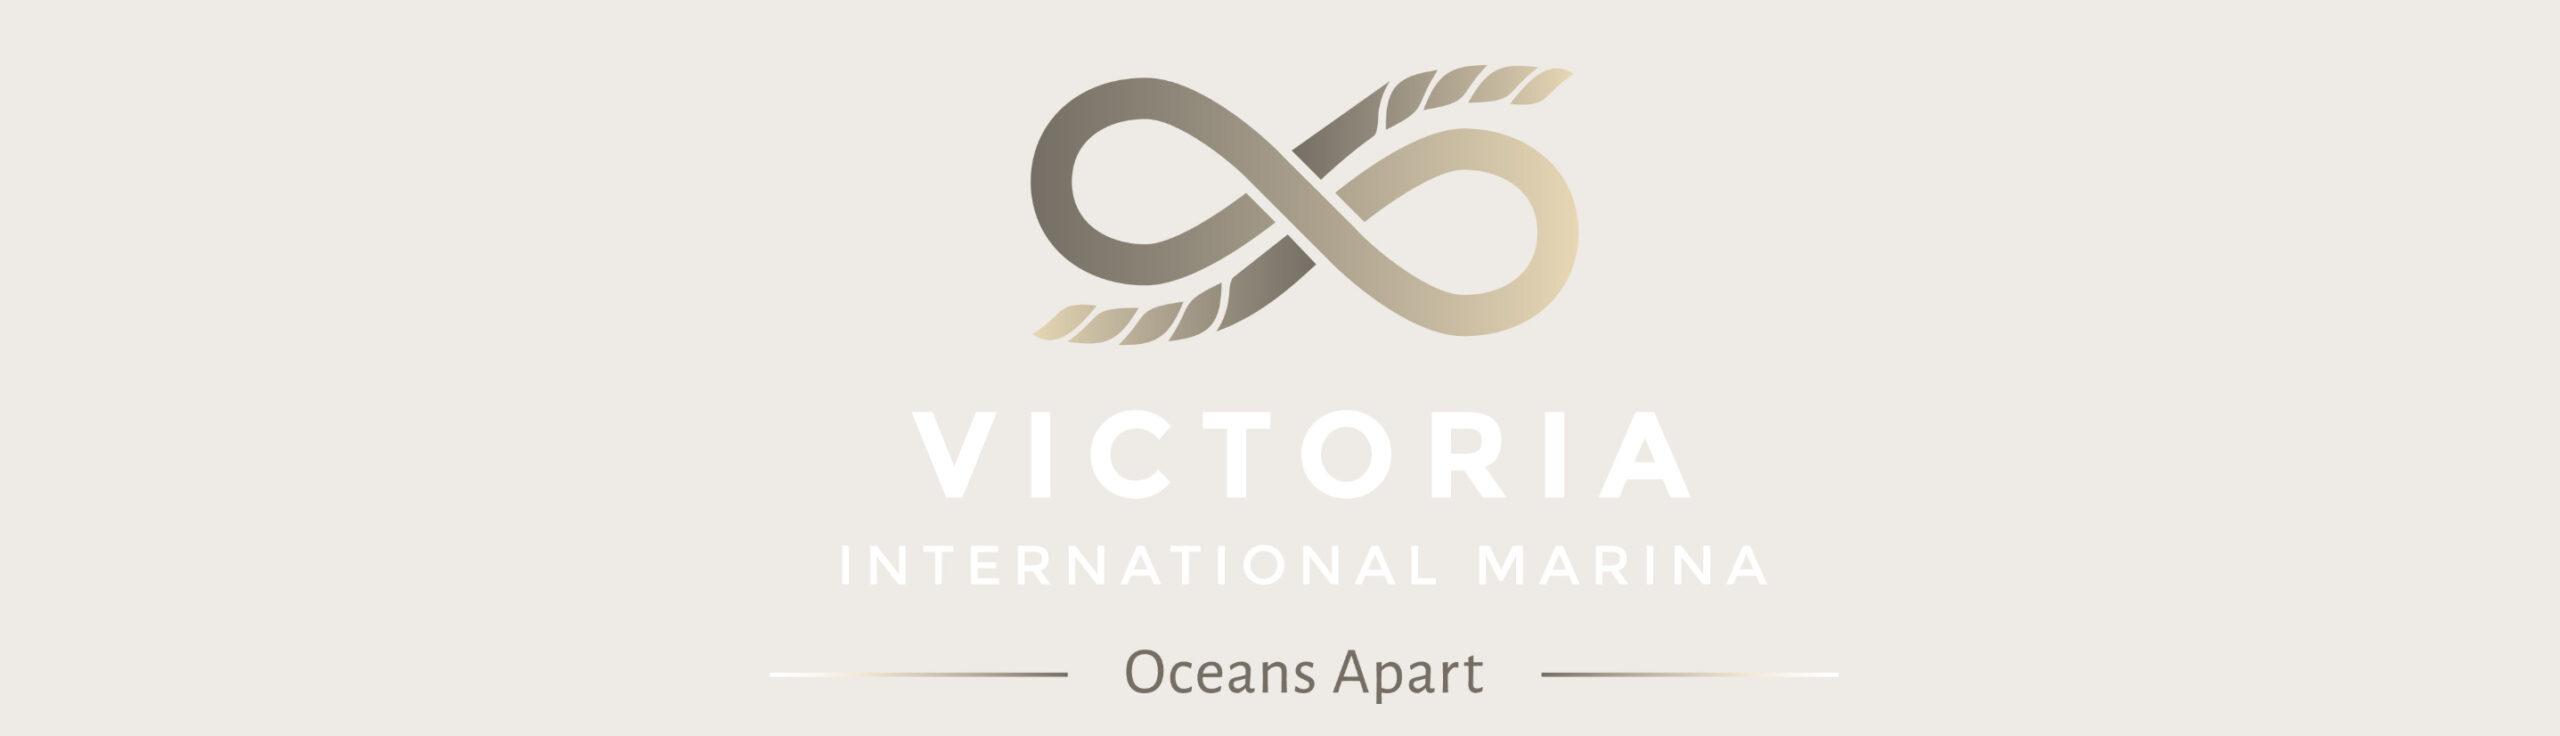 Victoria International Marina Header